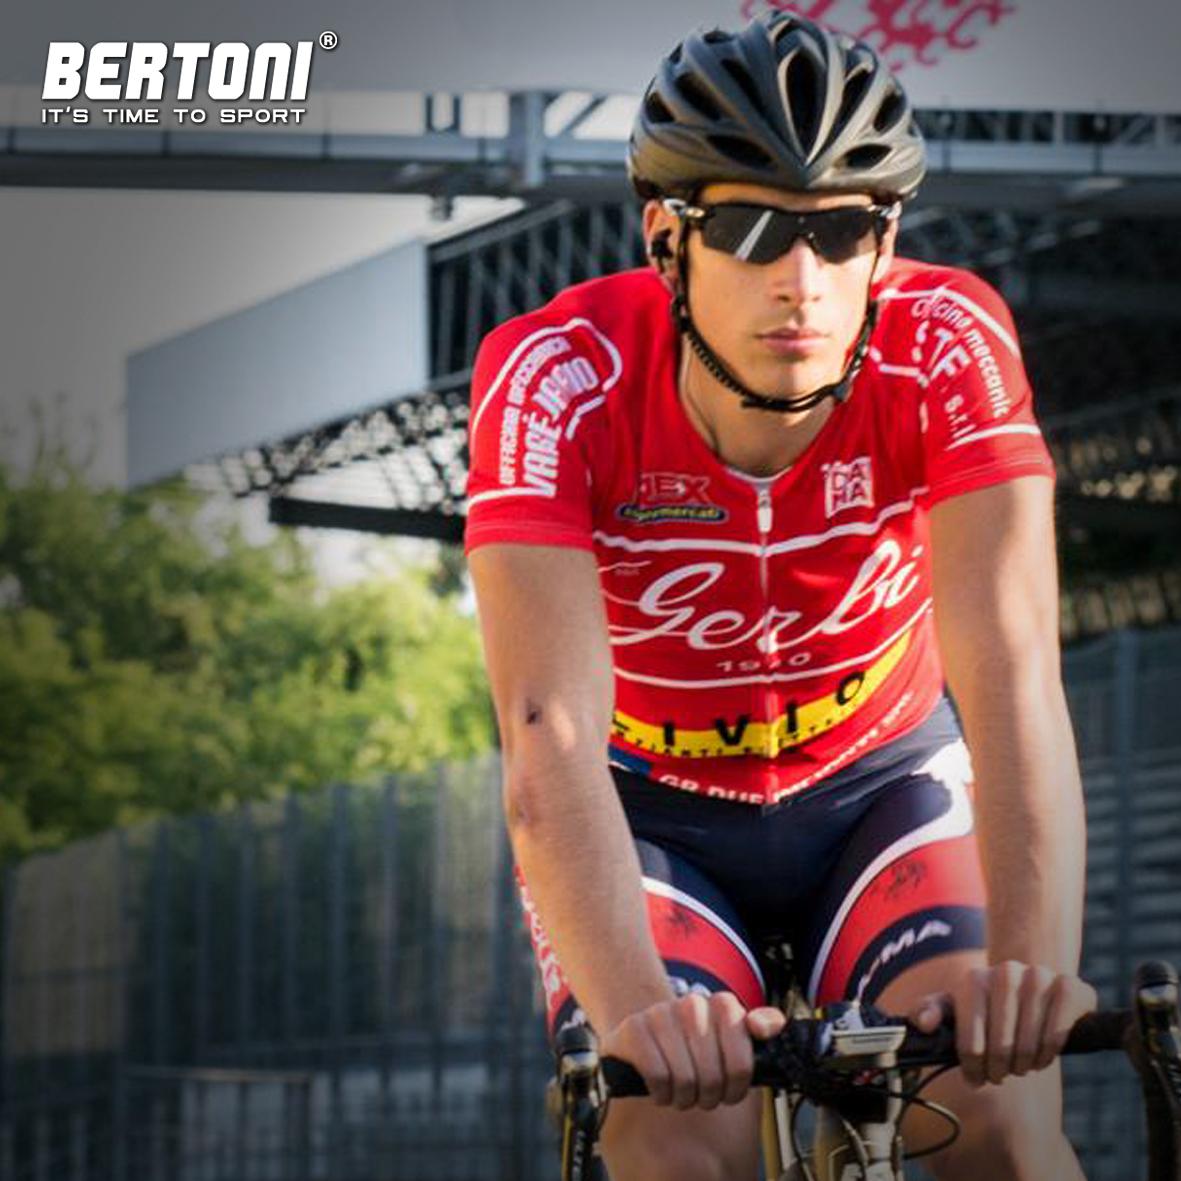 Team Gerbi - Ciclismo - Italia